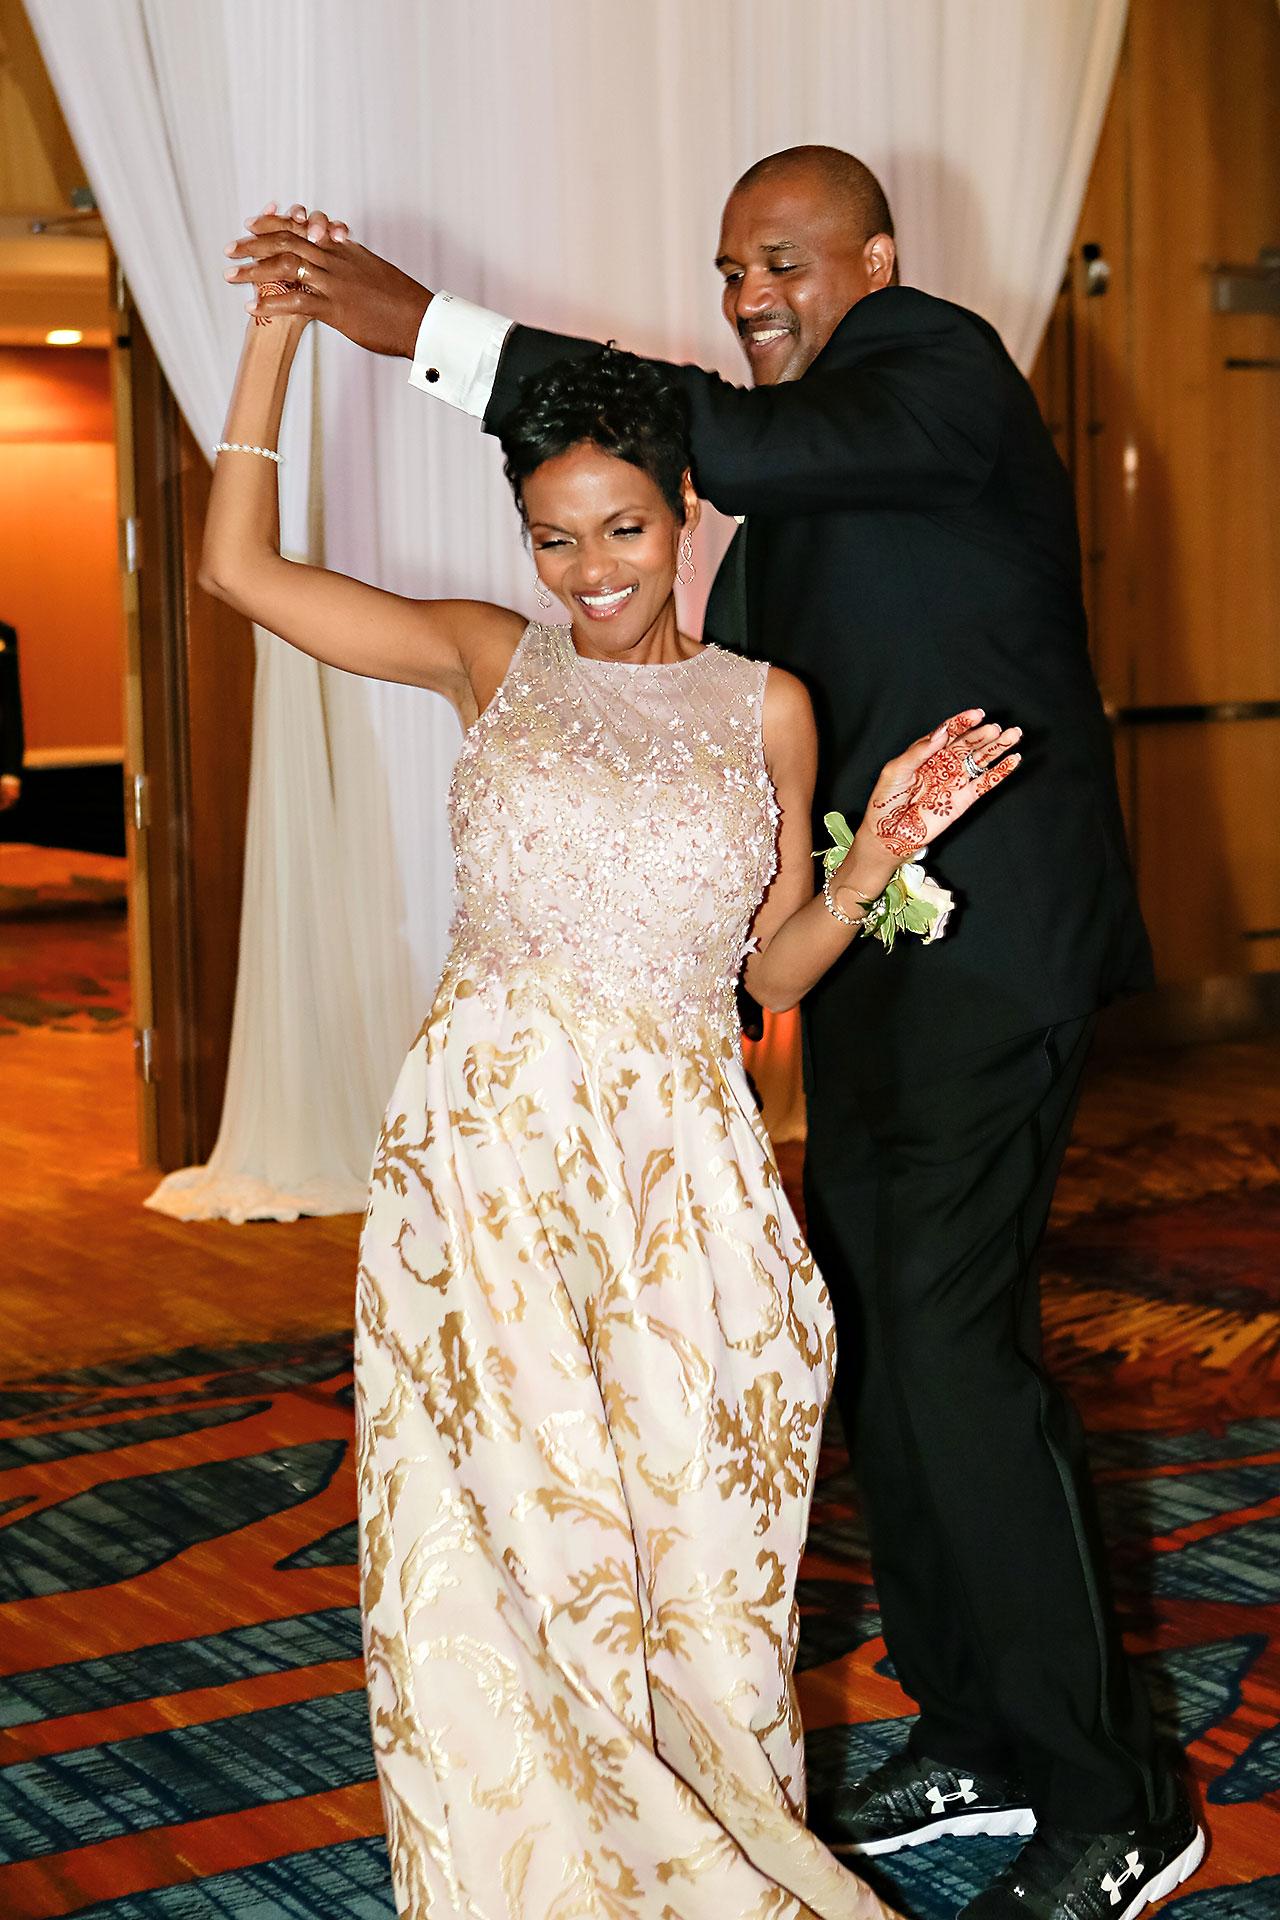 Joie Nikhil JW Marriott Indianapolis Wedding 063